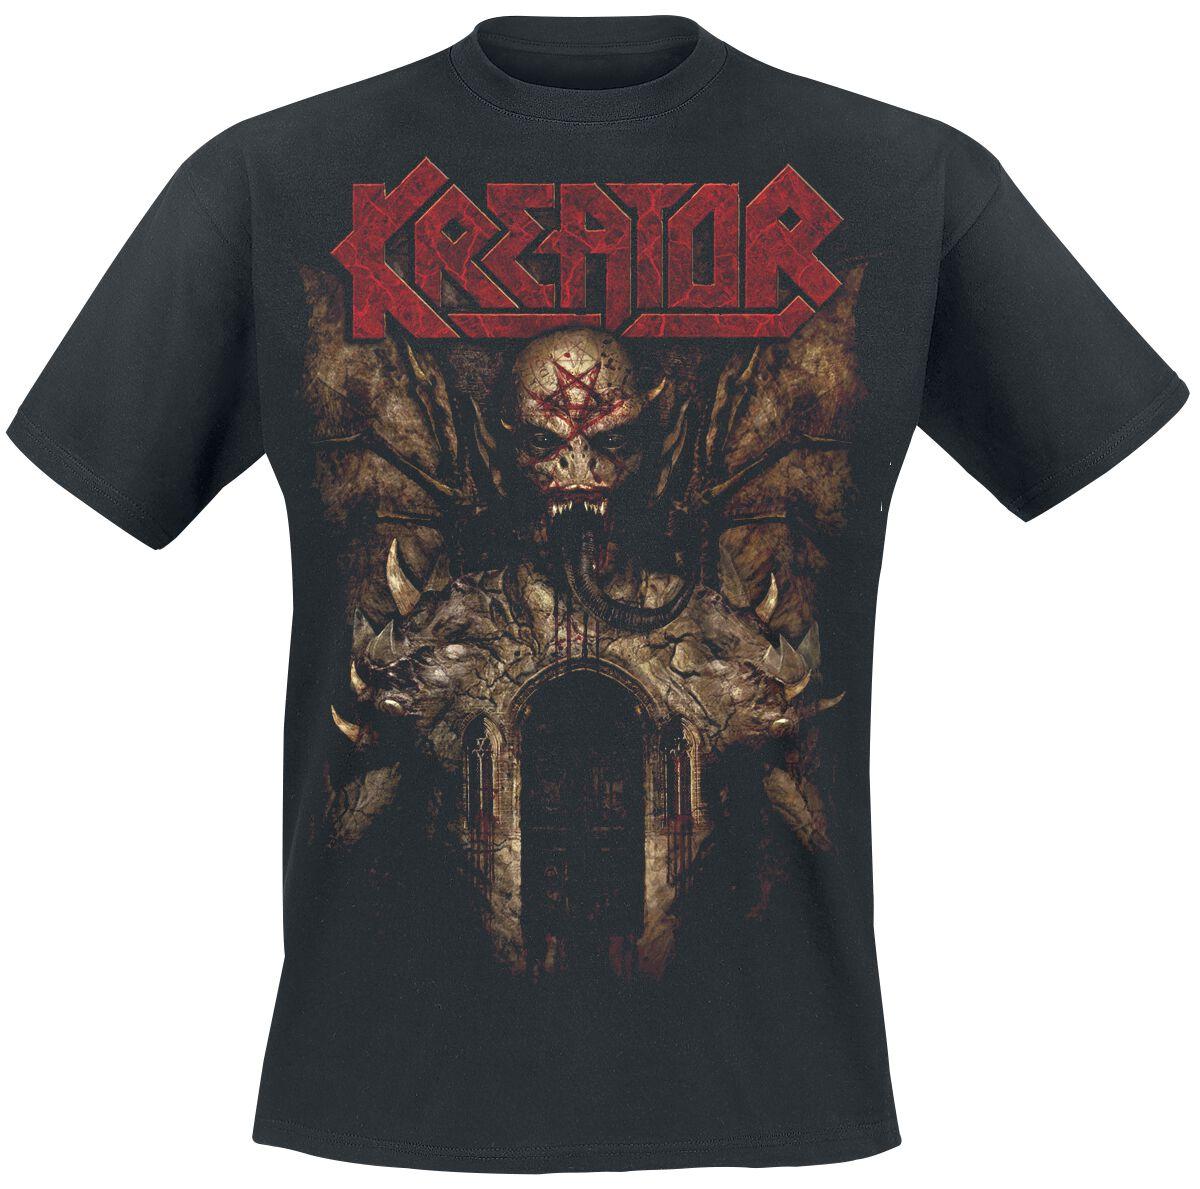 Zespoły - Koszulki - T-Shirt Kreator Gods of Violence T-Shirt czarny - 349153